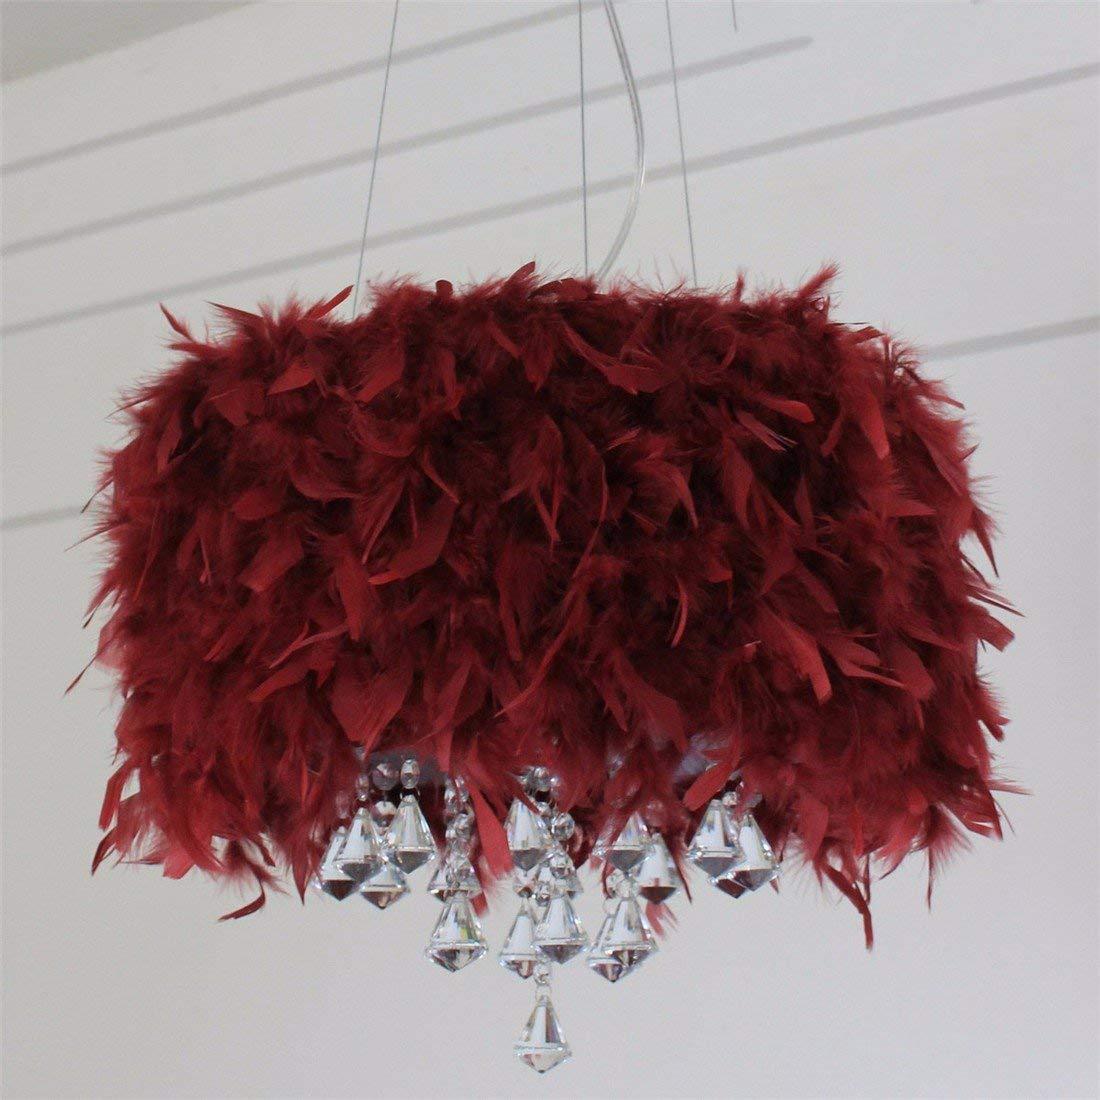 LAONA Creative crystal lamp, LED living room, study room, bedroom, simple modern European romantic feather pendant lamp,40CM-Red wine